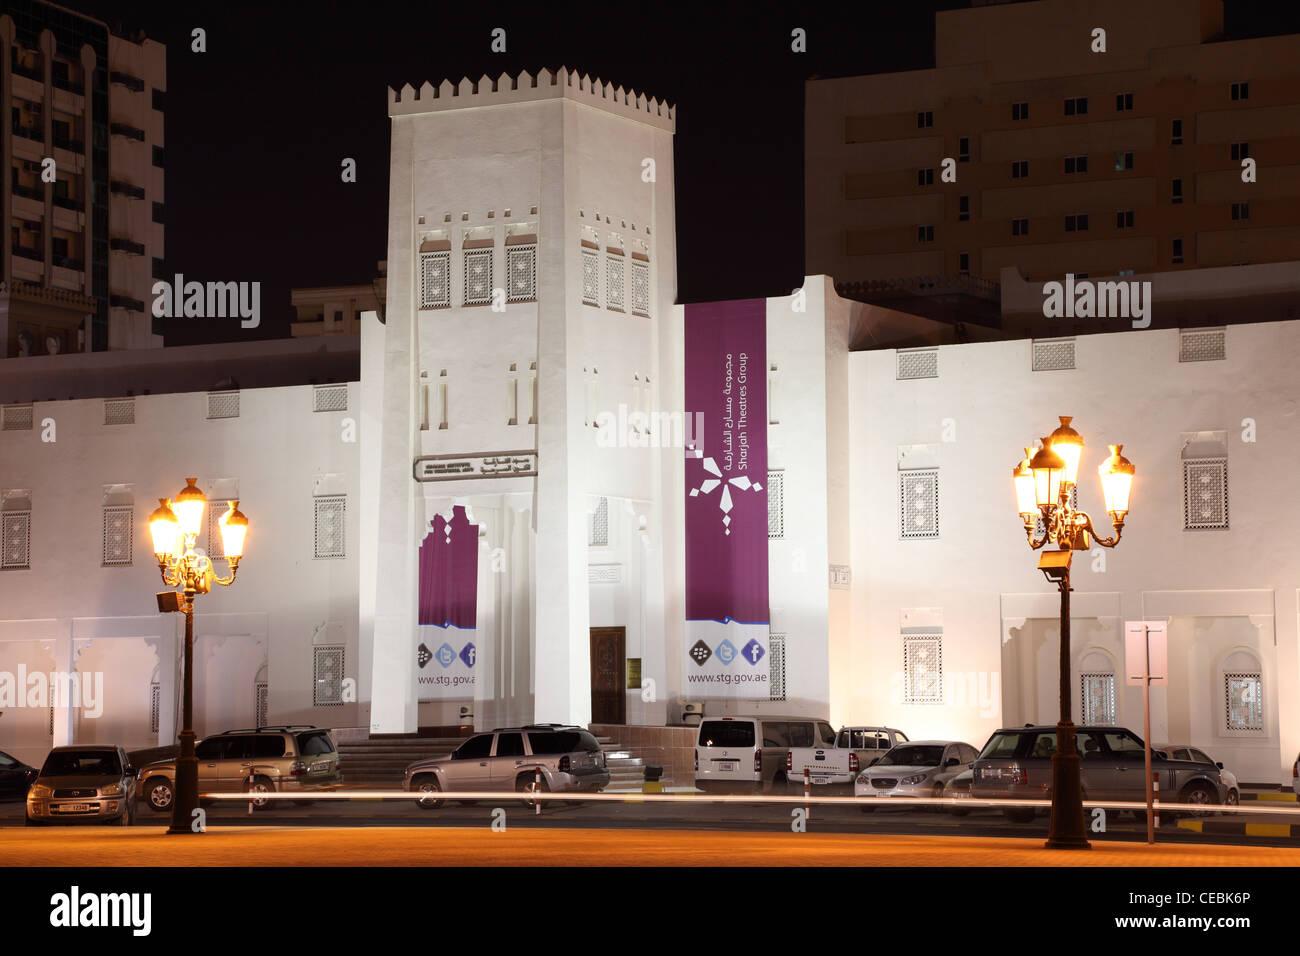 Sharjah Institute of Theatrical Arts at night, United Arab Emirates. - Stock Image